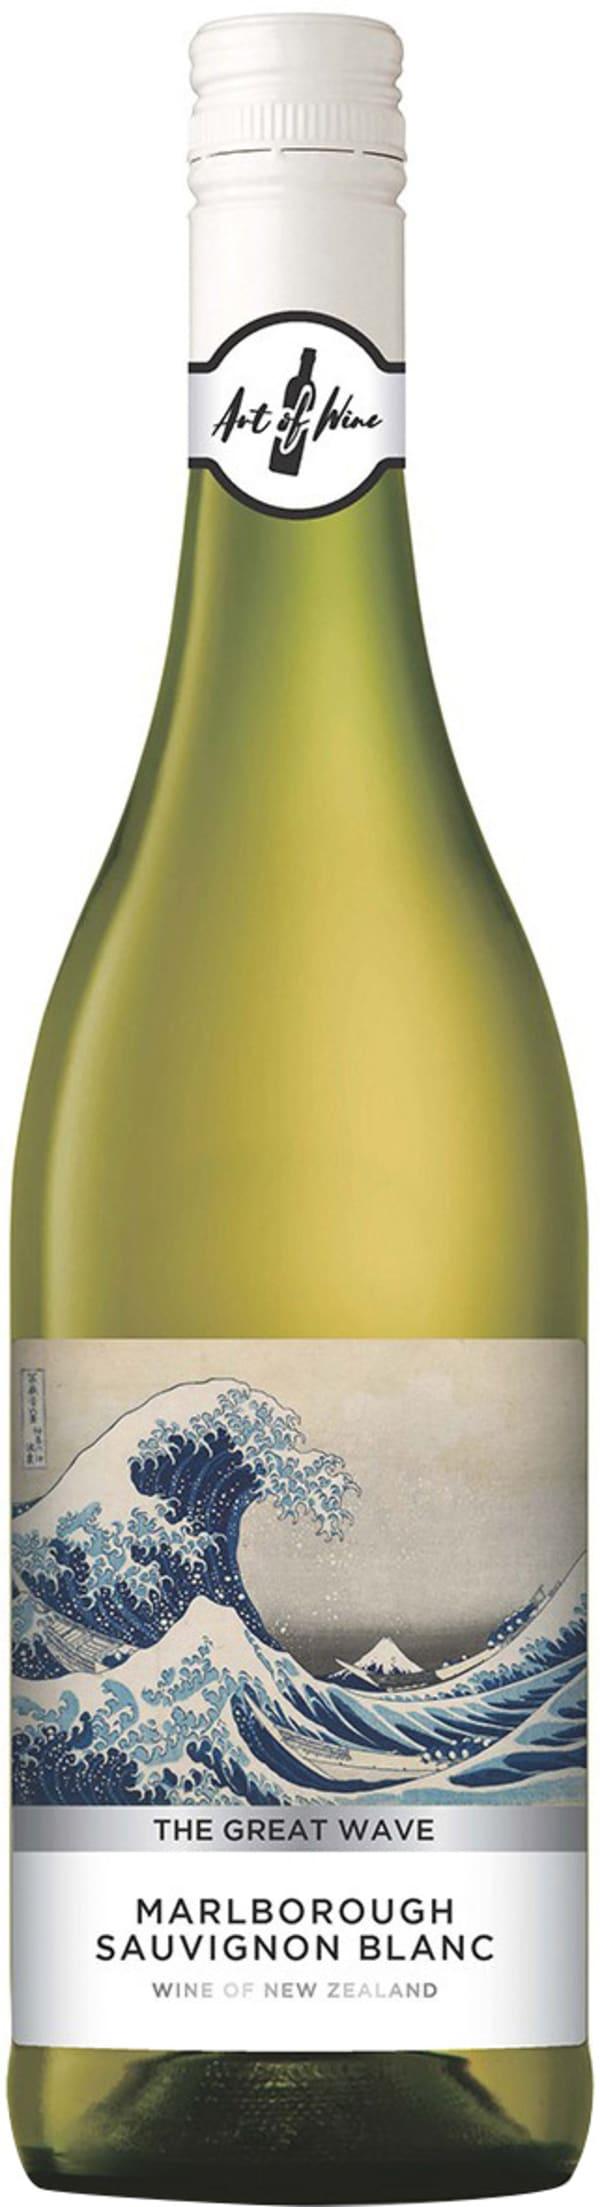 The Great Wave Sauvignon Blanc 2020